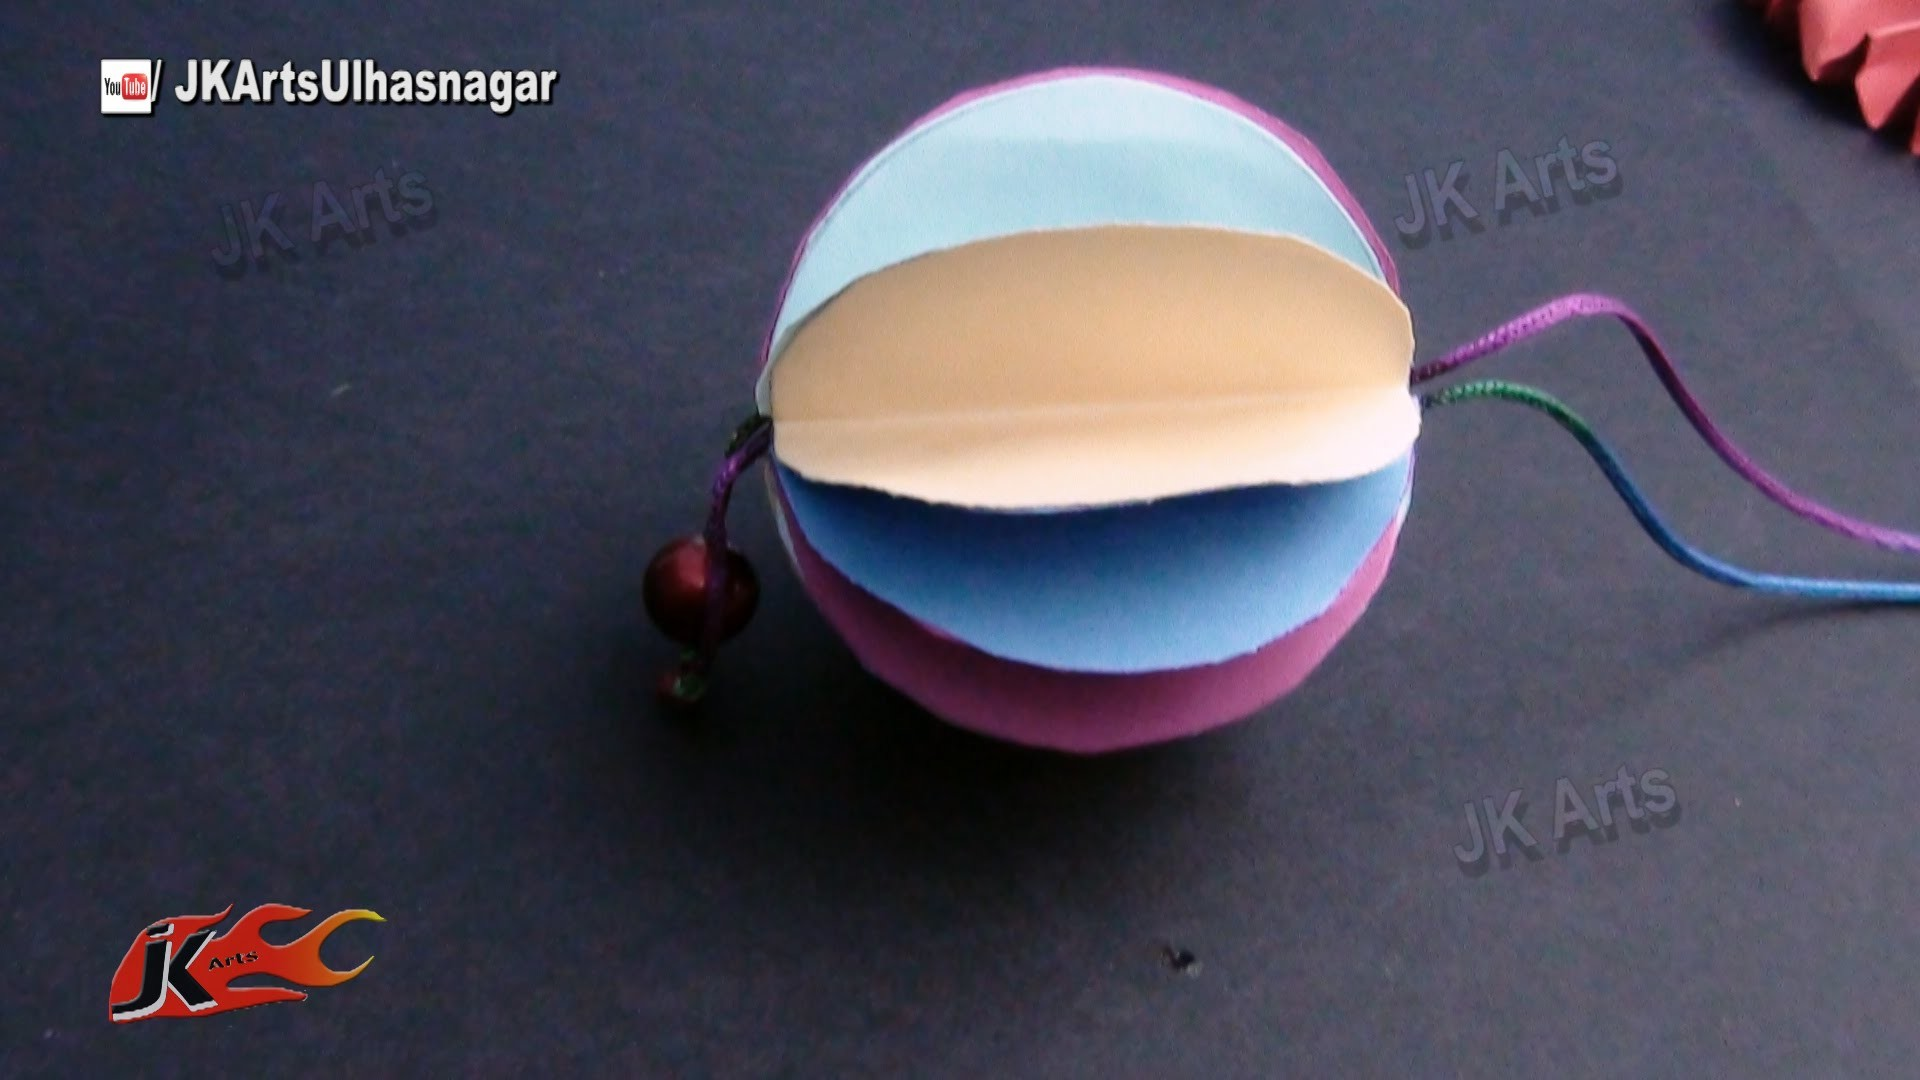 DIY Paper Ball Christmas Ornament | How to make | JK Arts 818